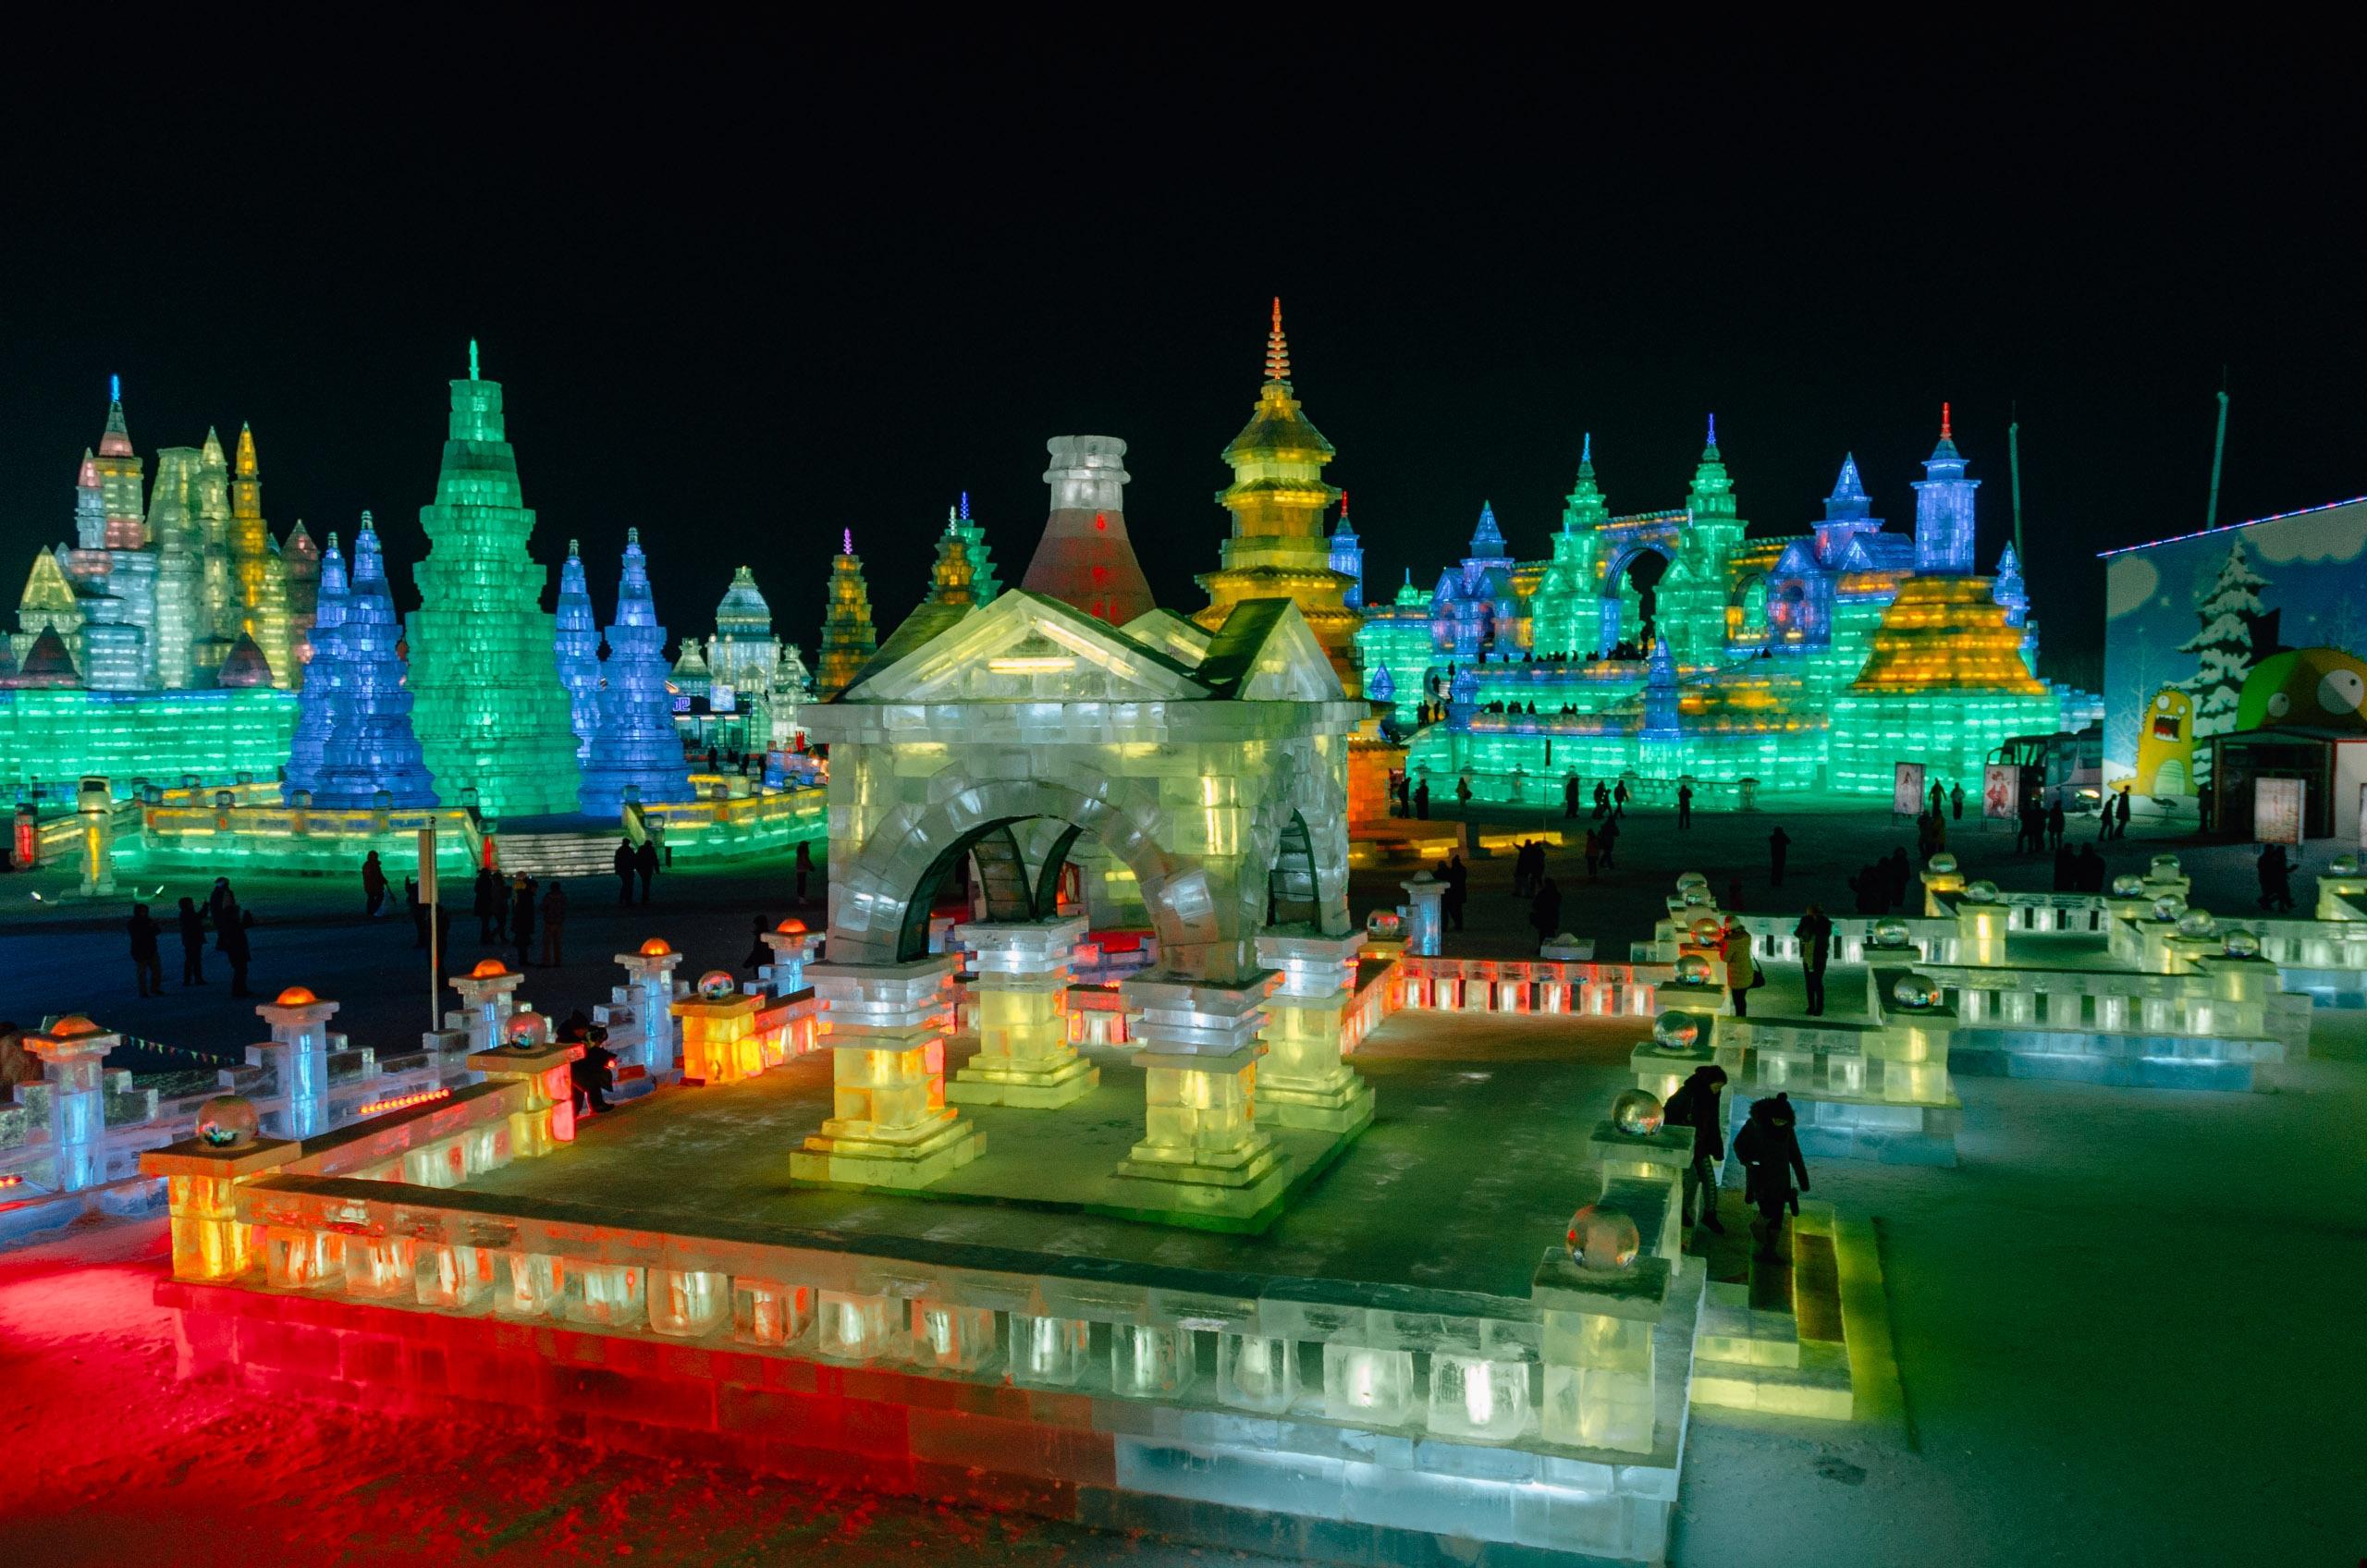 Harbin China Ice Festival - 2012-0108-DSC_2087_96799